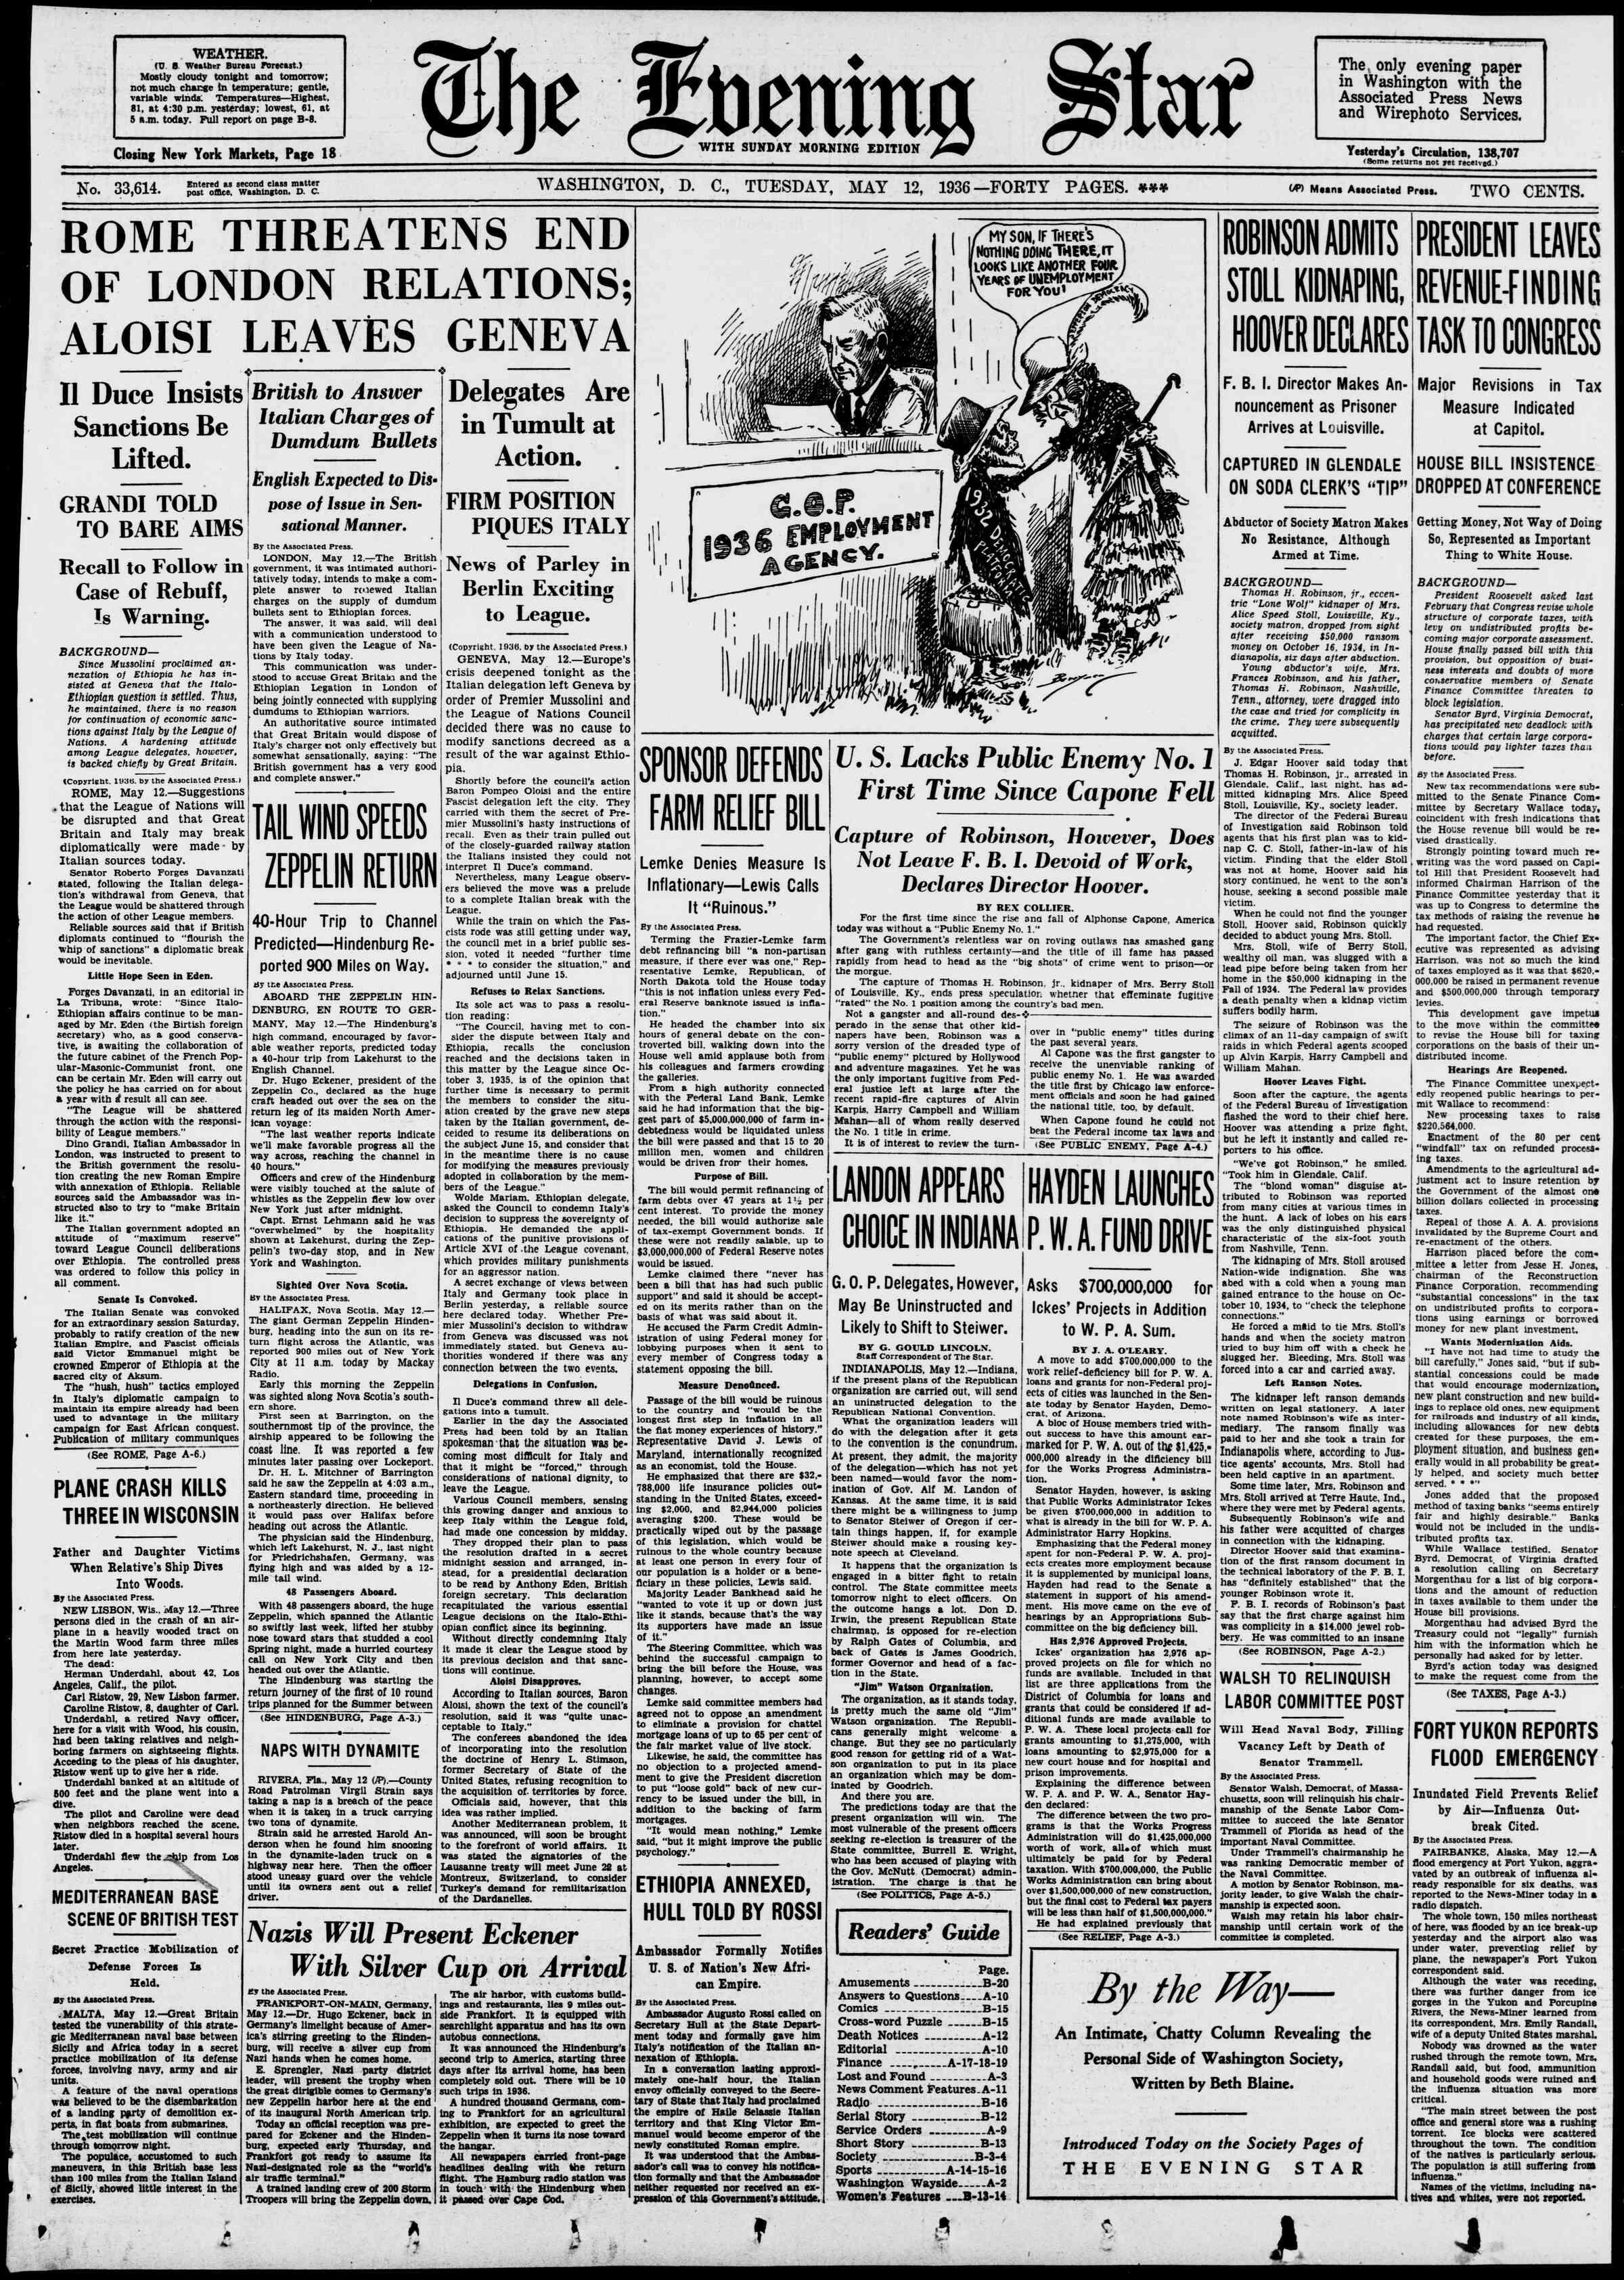 12 Mayıs 1936 Tarihli Evening Star Gazetesi Sayfa 1